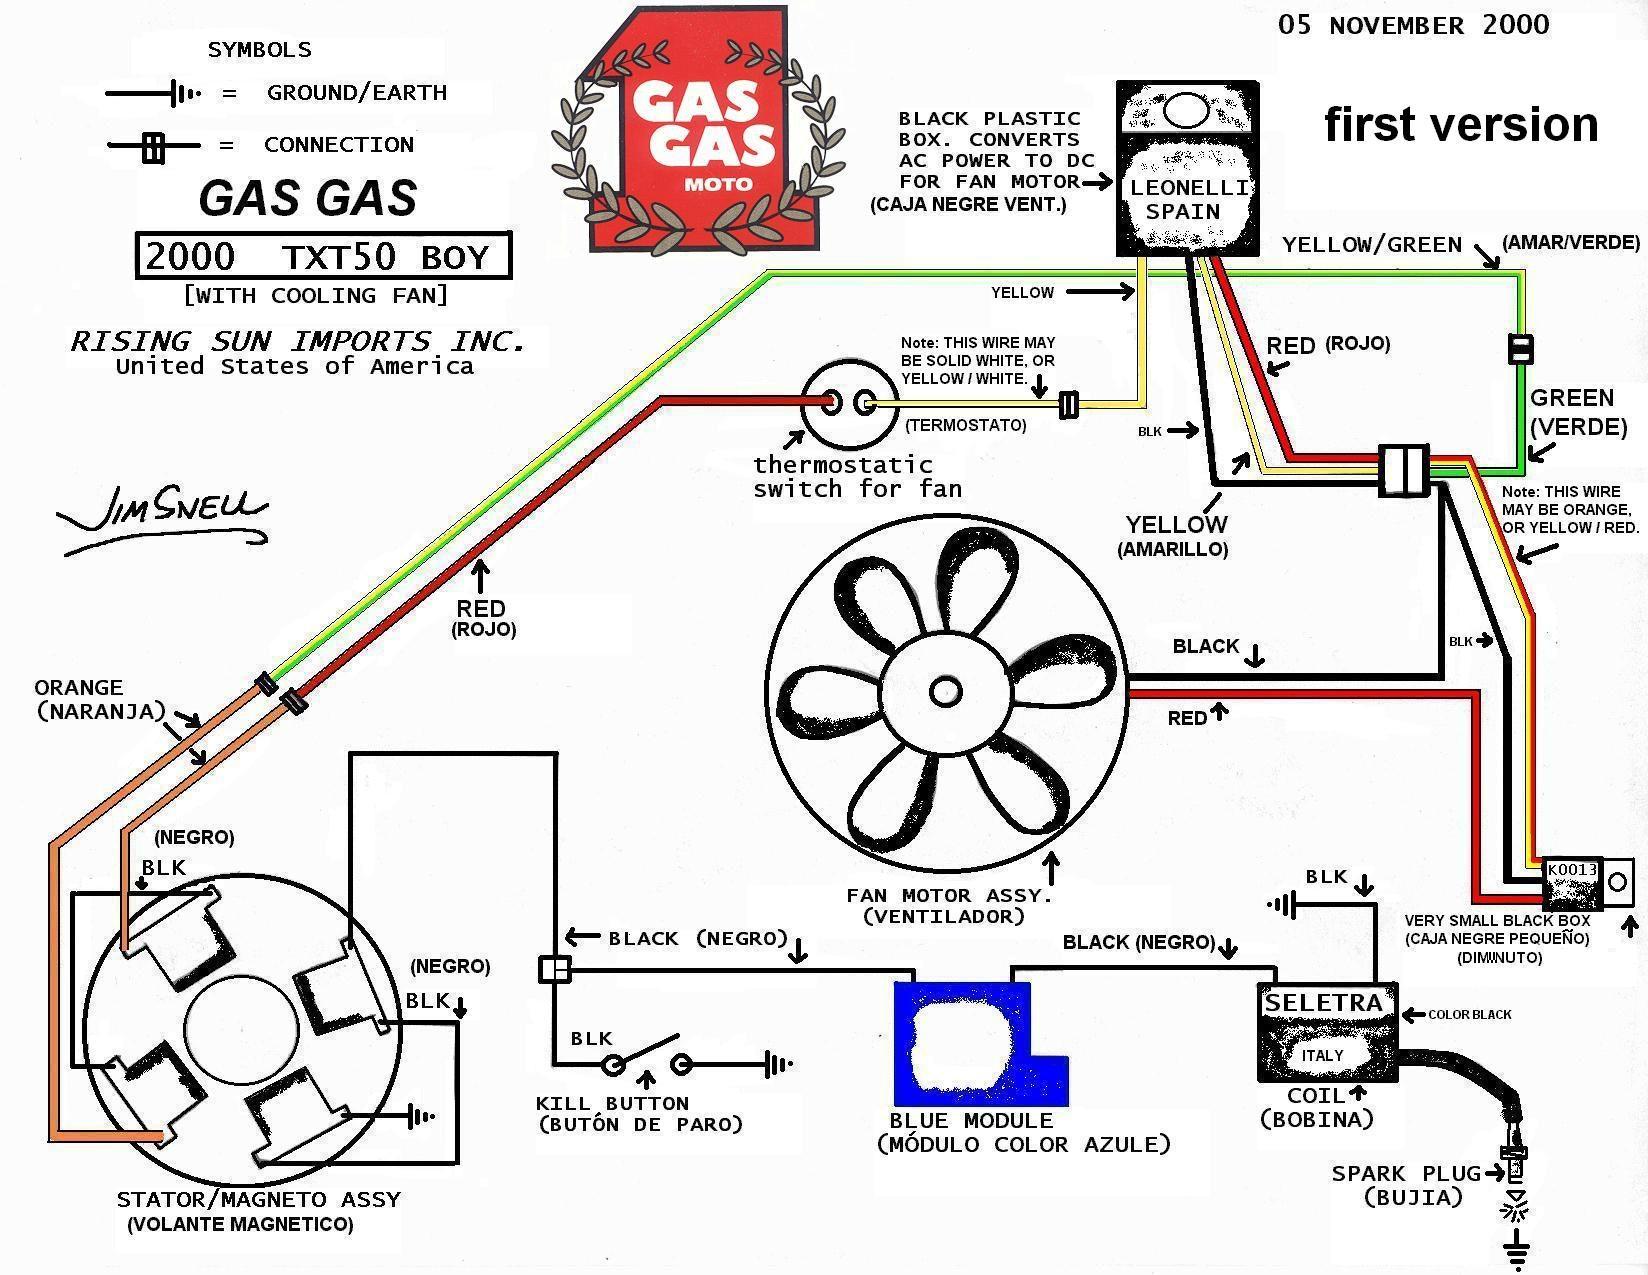 Cdi Wiring Diagram | Hastalavista - Cdi Wiring Diagram